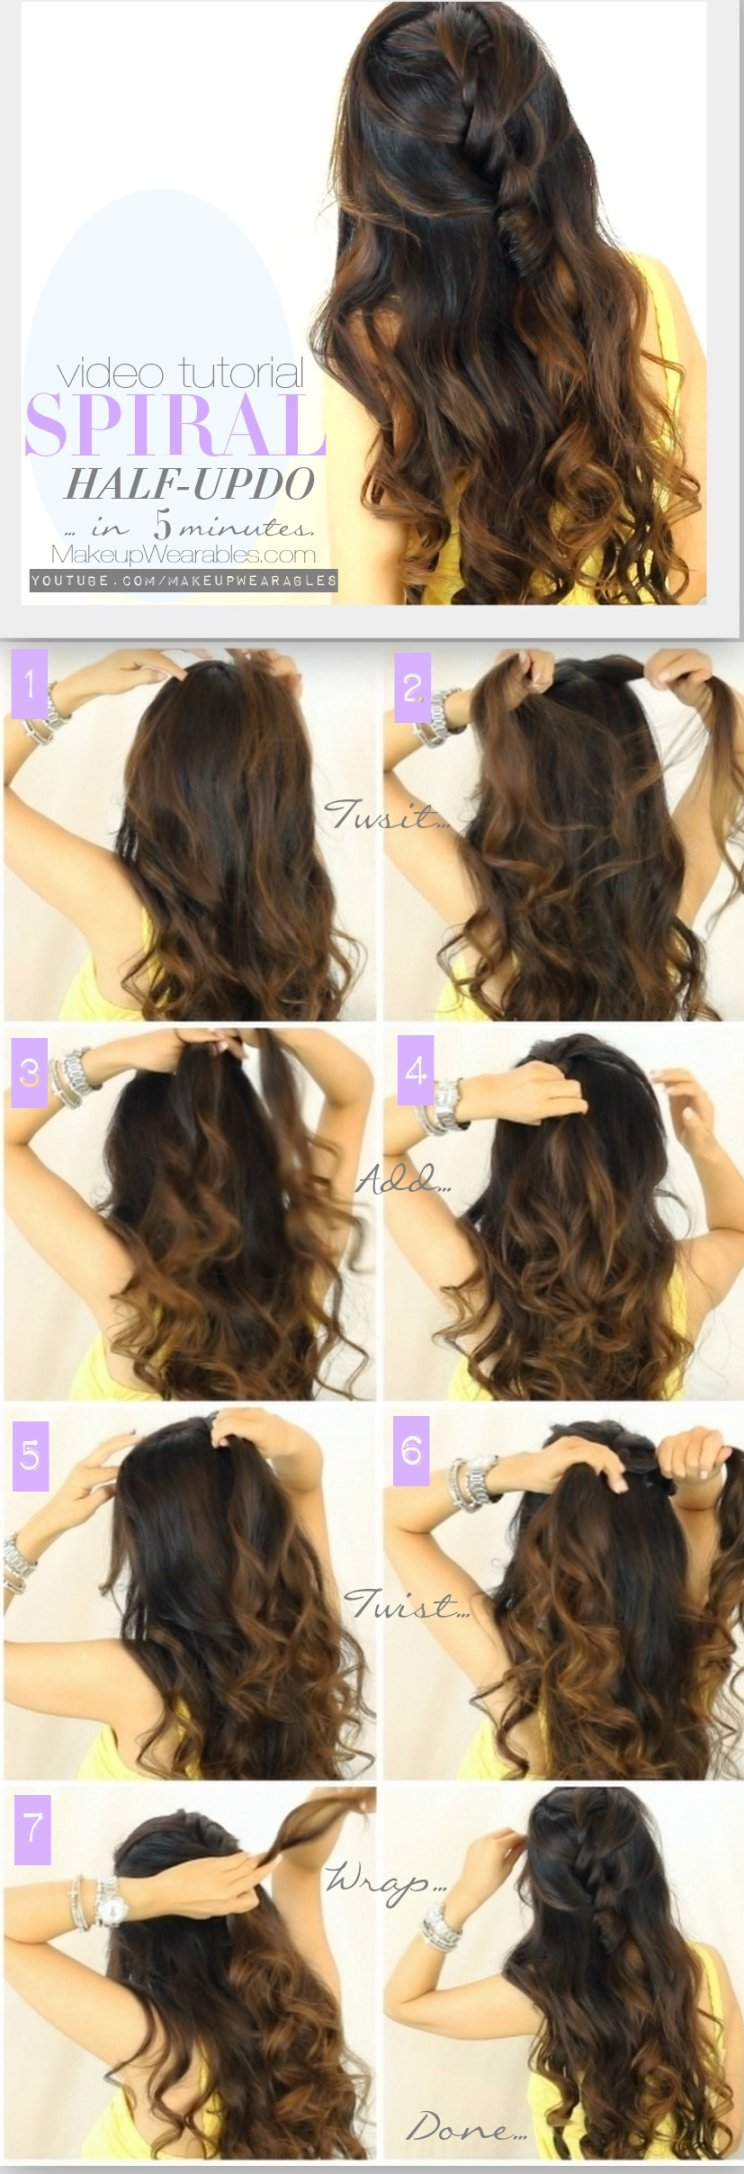 12 Half Up Half Down Hair Tutorials You Must Have Pretty